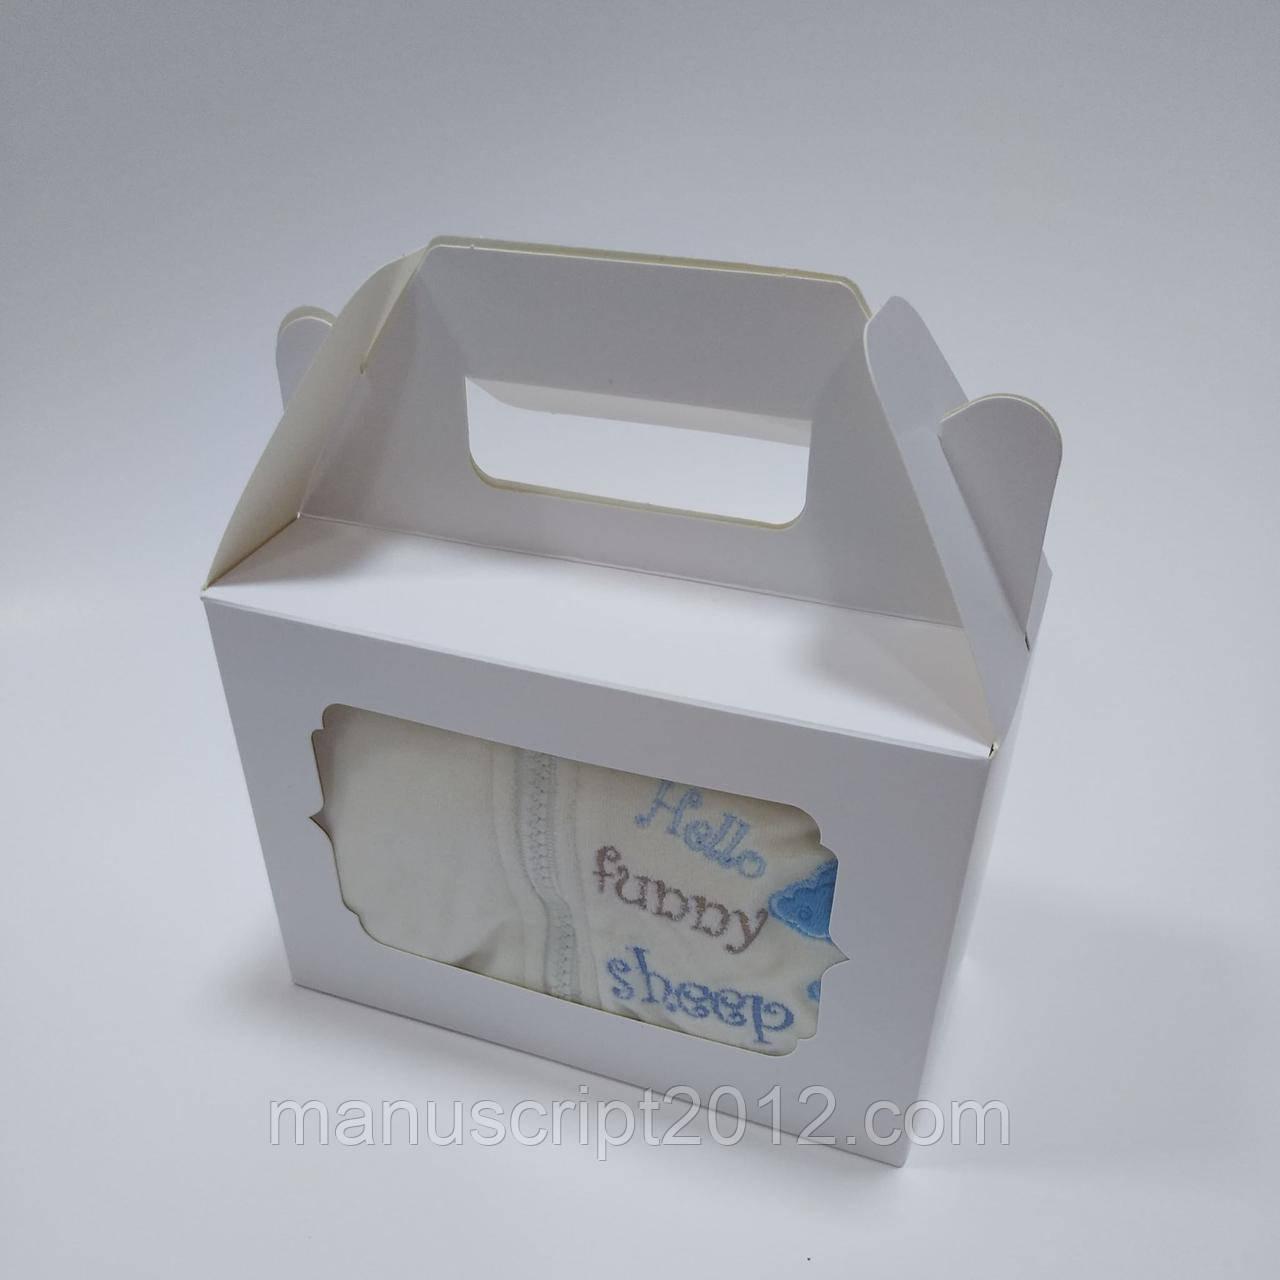 Коробка для подарков с фигурным окном белая 190х130х90 мм.